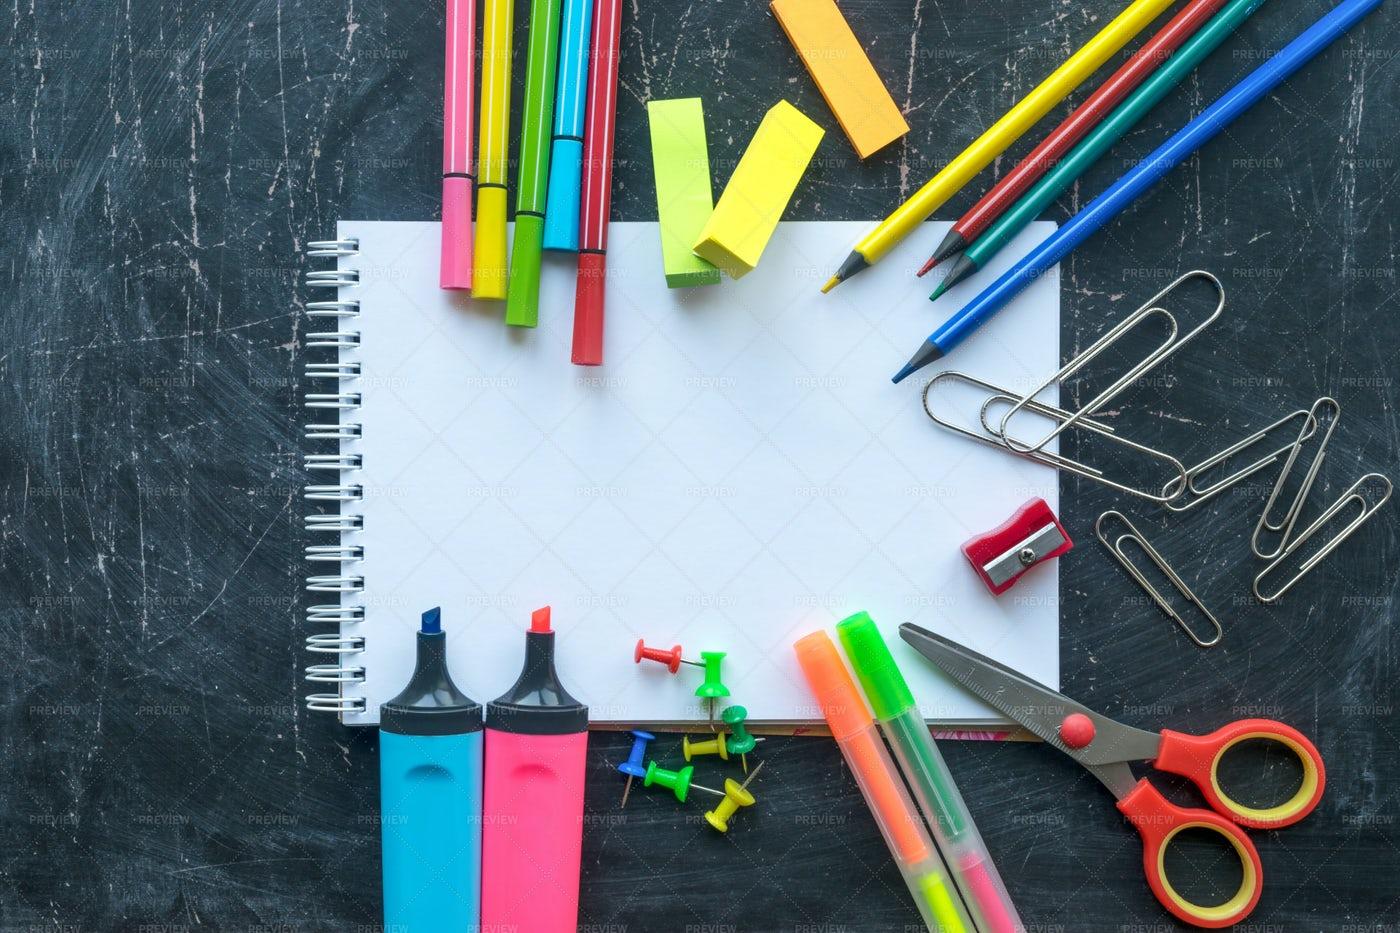 School Supplies On A Chalkboard: Stock Photos